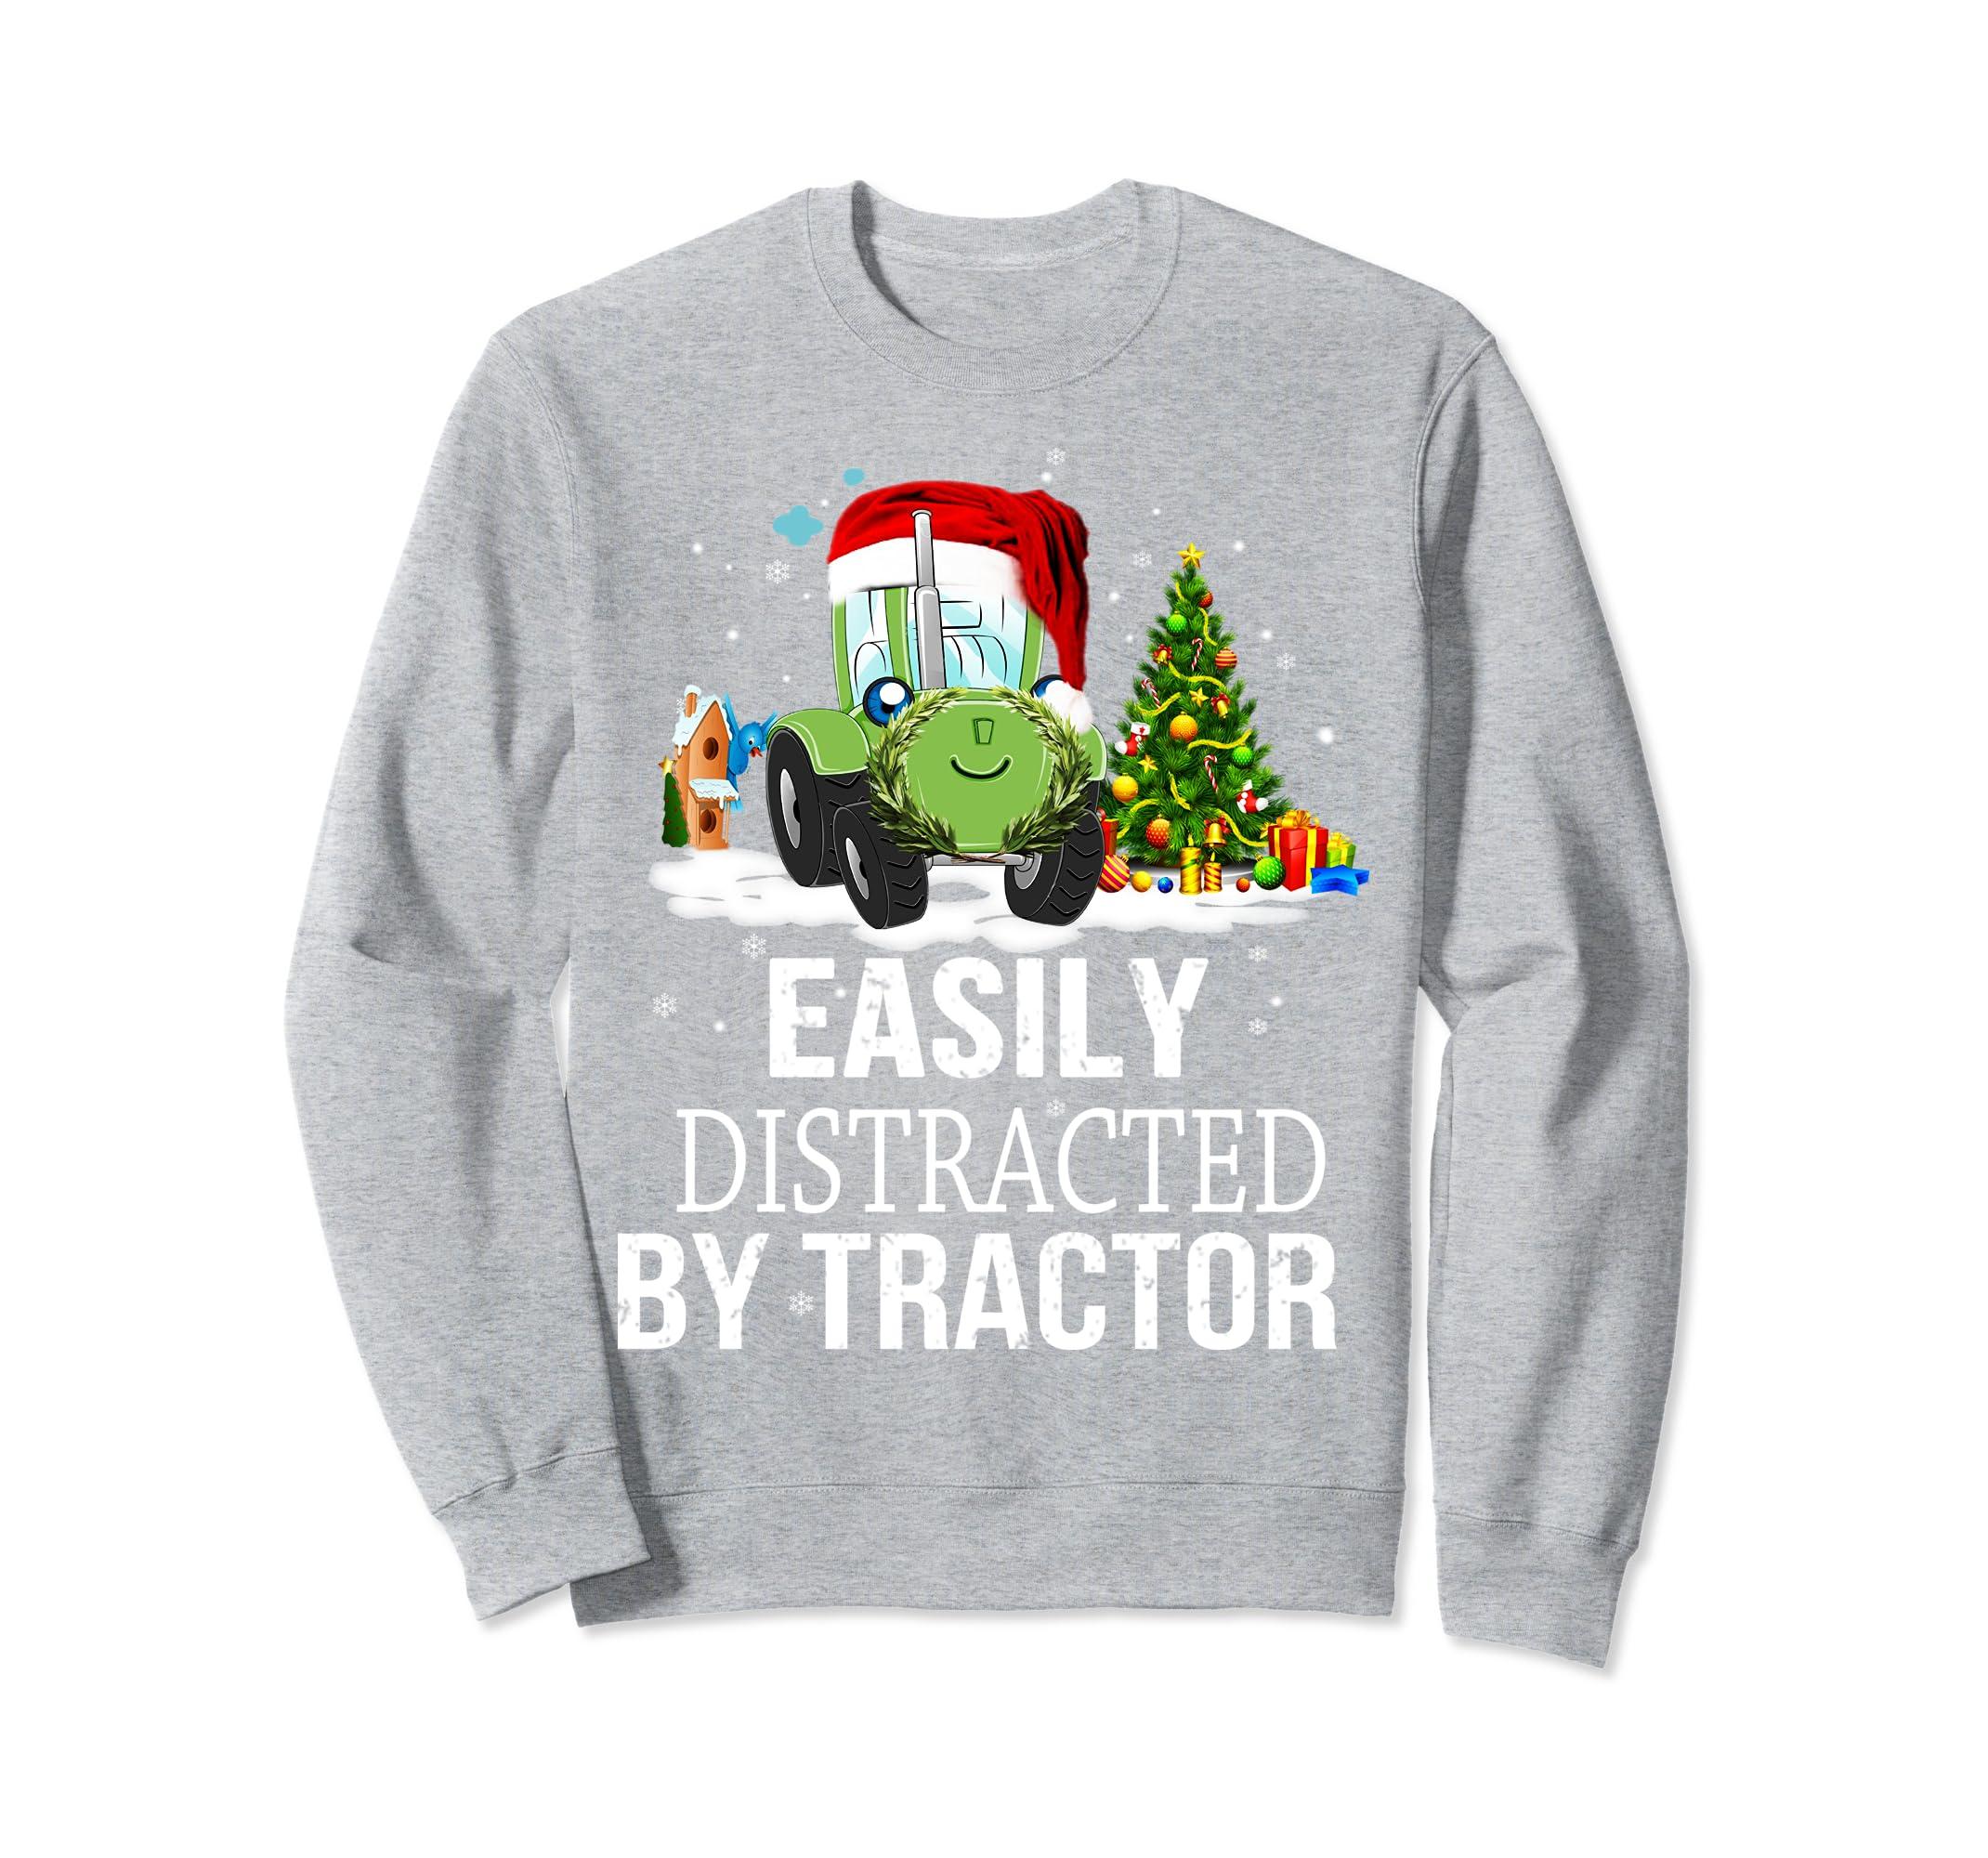 Easily Distracted By Tractors Christmas Sweatshirt and tee-azvn